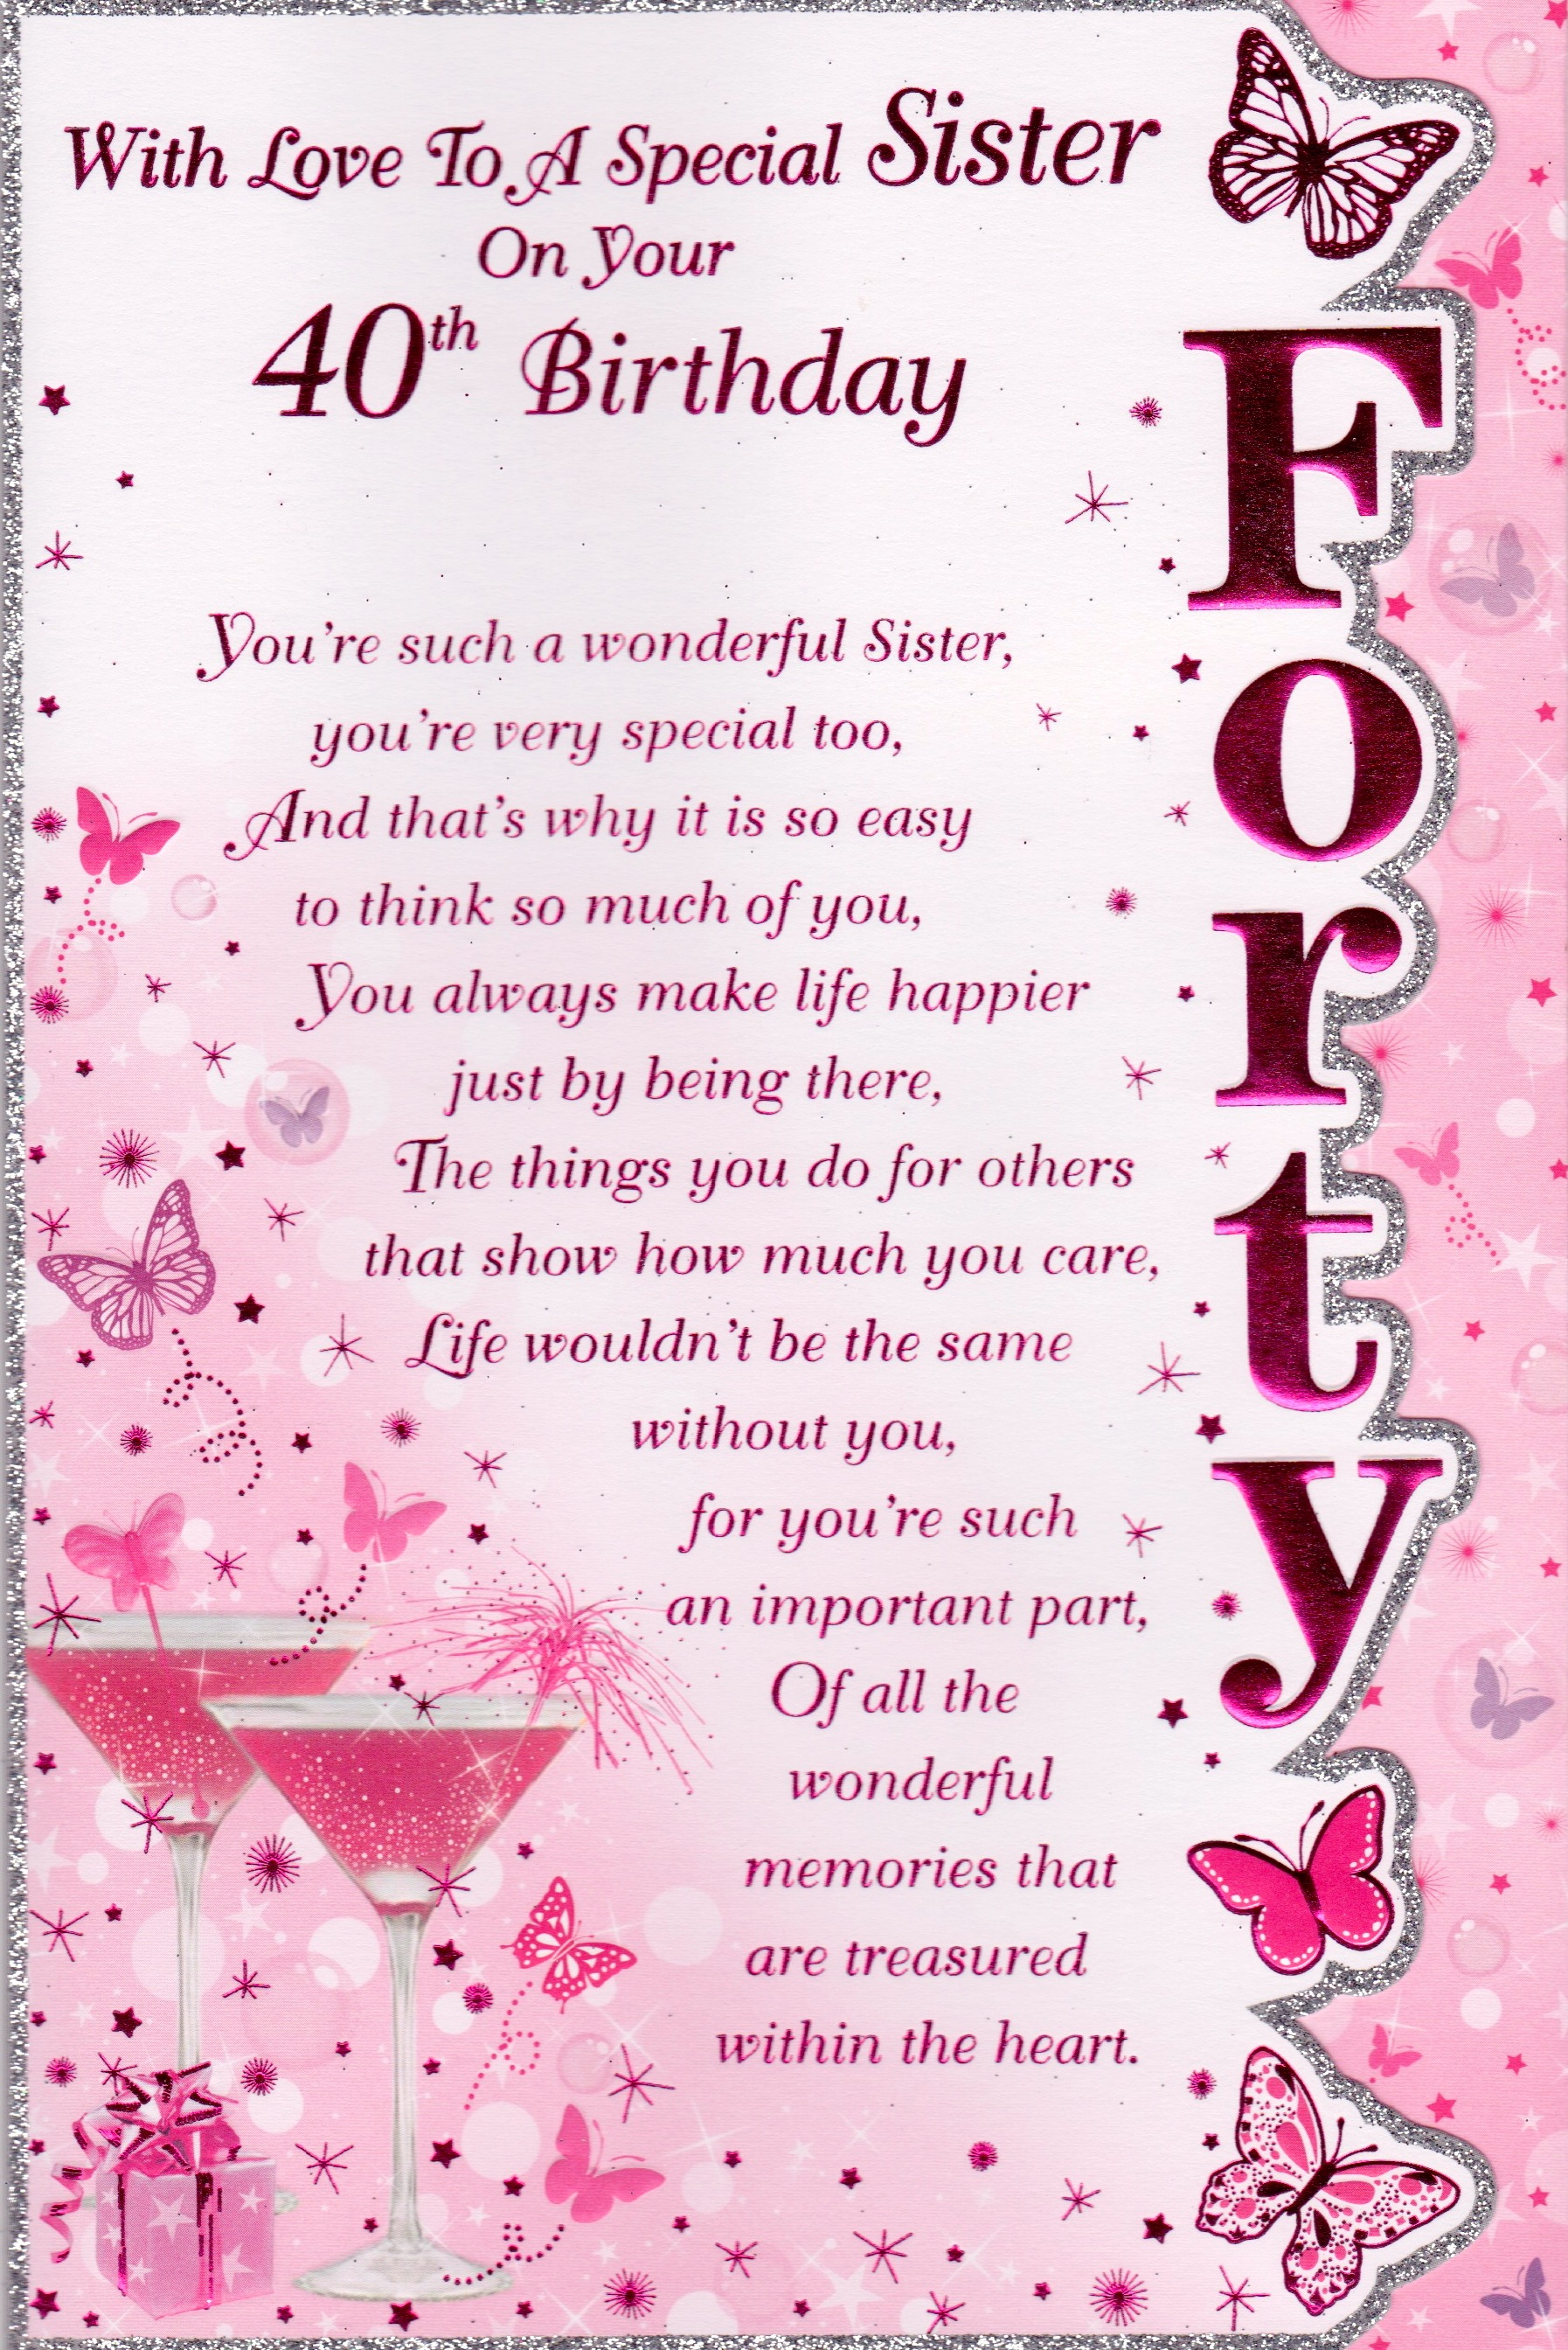 Birthday greetings poems m4hsunfo